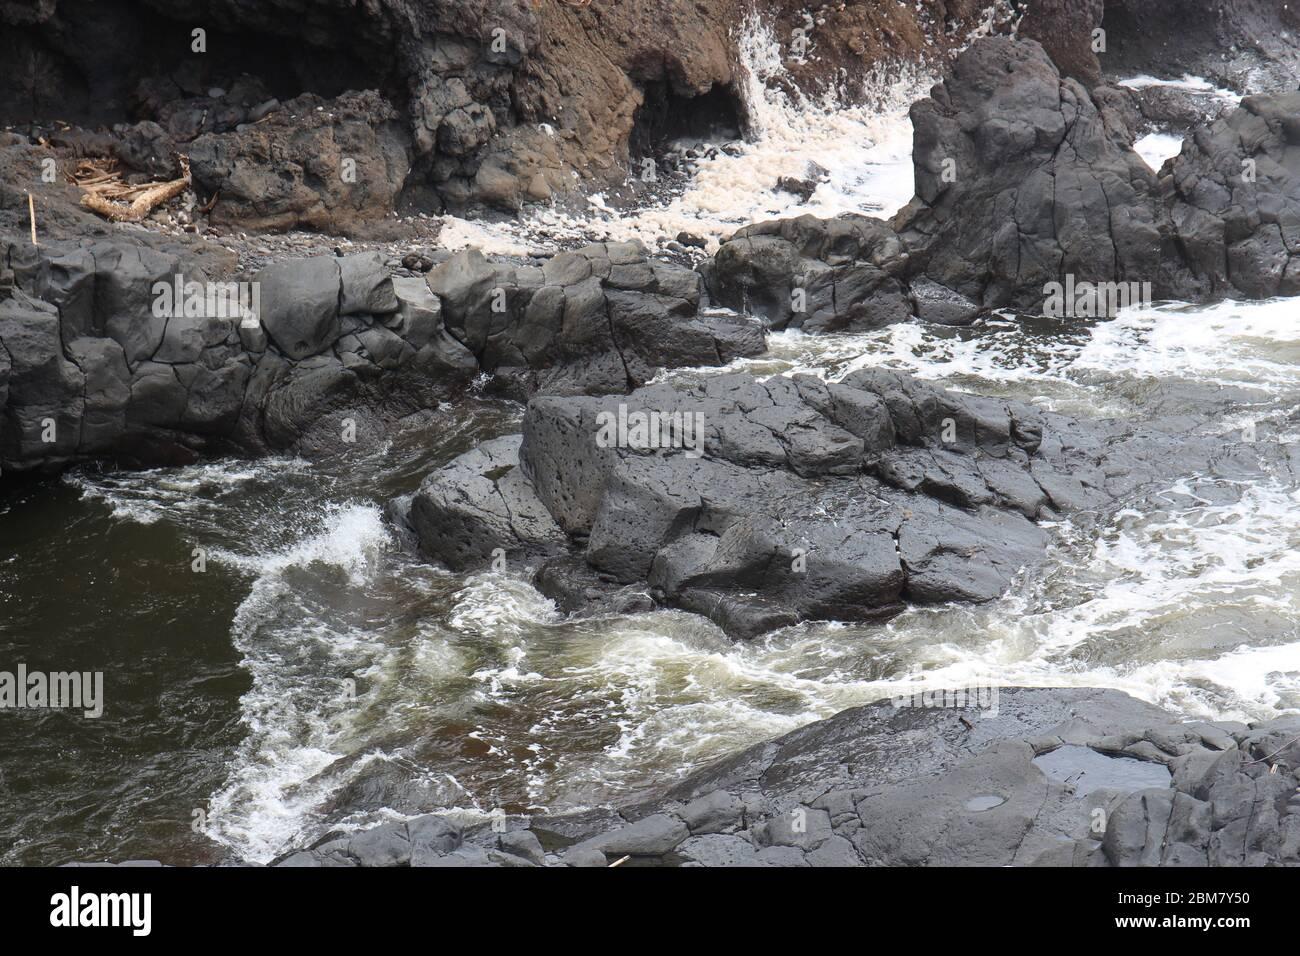 Palikea stream running through volcanic rock at the Oheo Gulch in Hana, Maui, Hawaii, USA Stock Photo